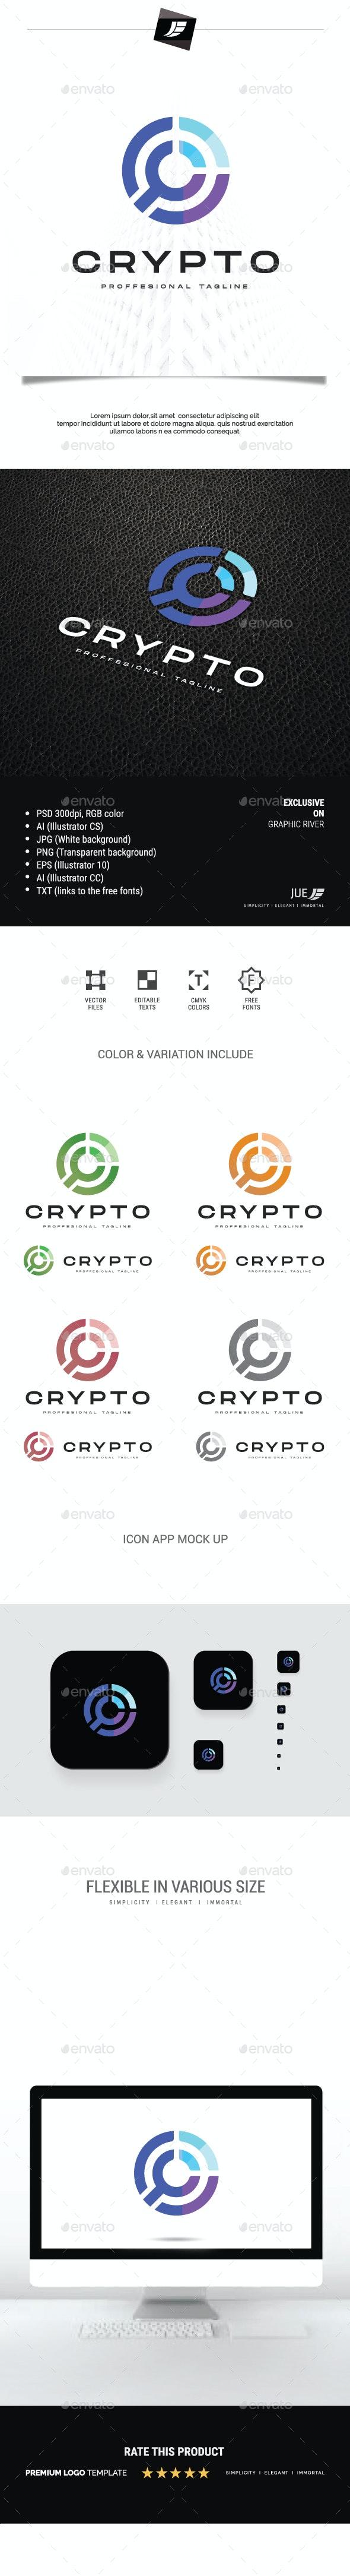 Letter C Crypto Finder Logo - Symbols Logo Templates